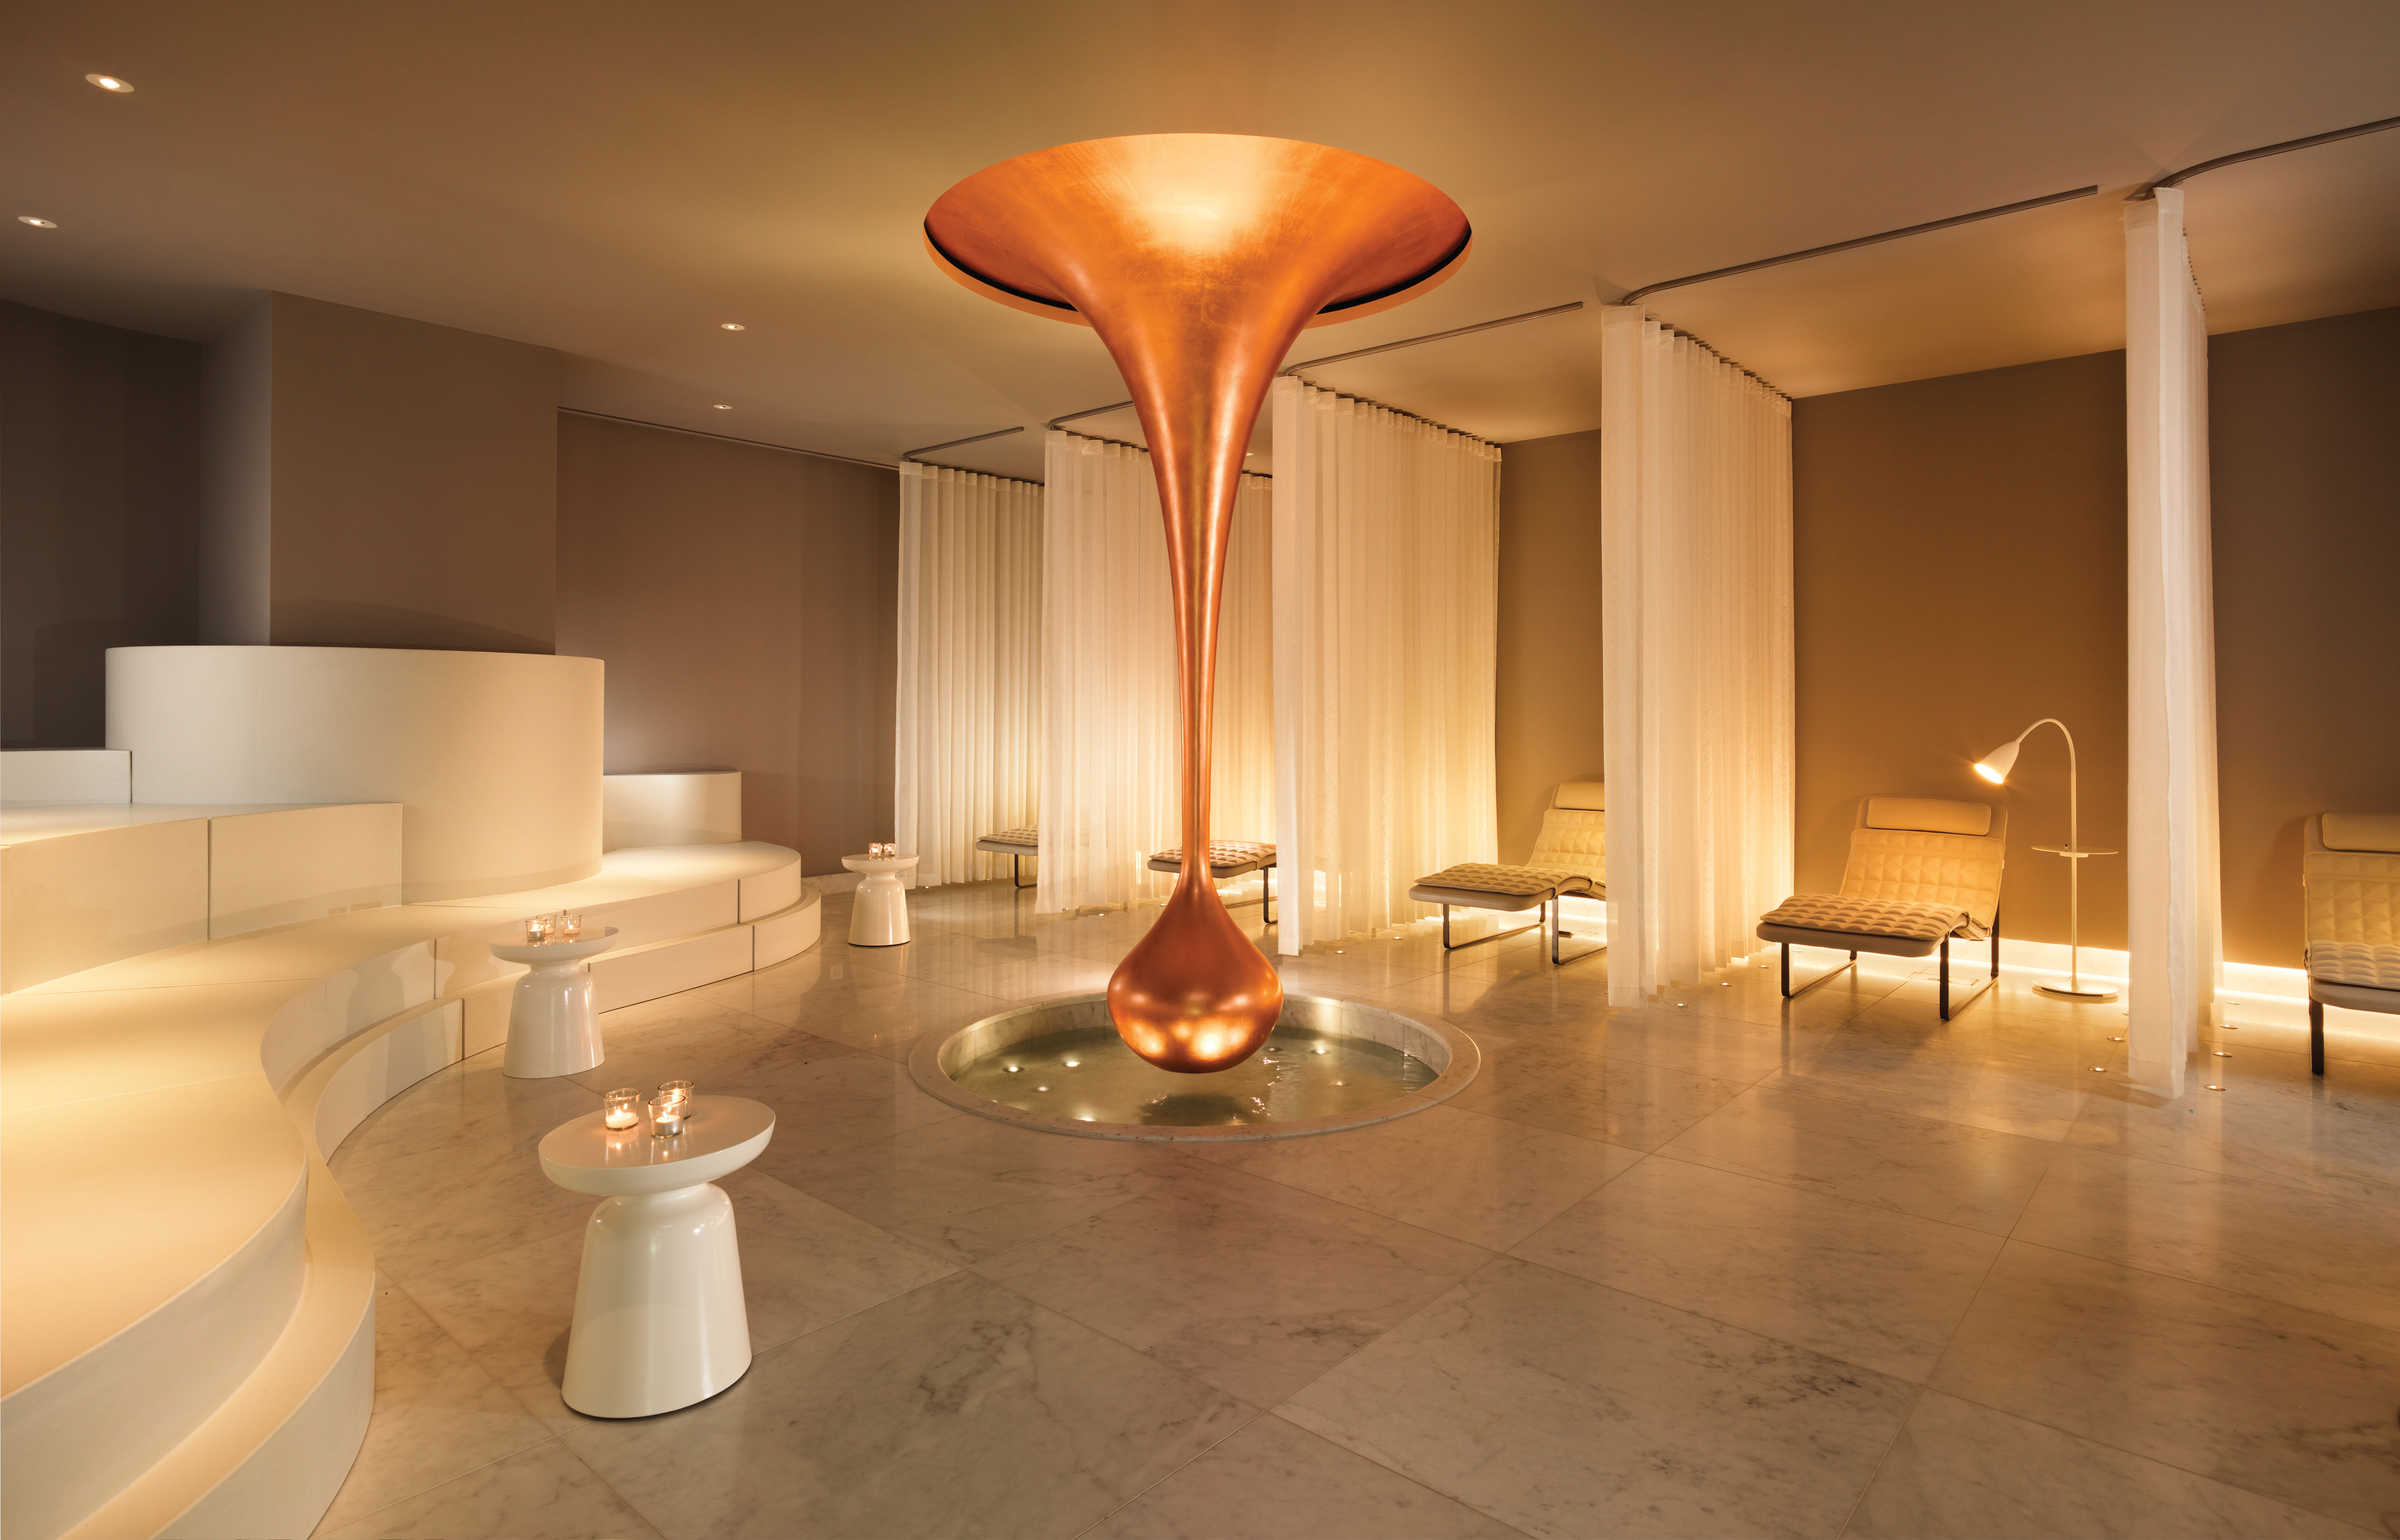 Mondrian-Bank-On-It-London-Nil-Do-Simon-Fort-Lauderdale-Venice-Magazine